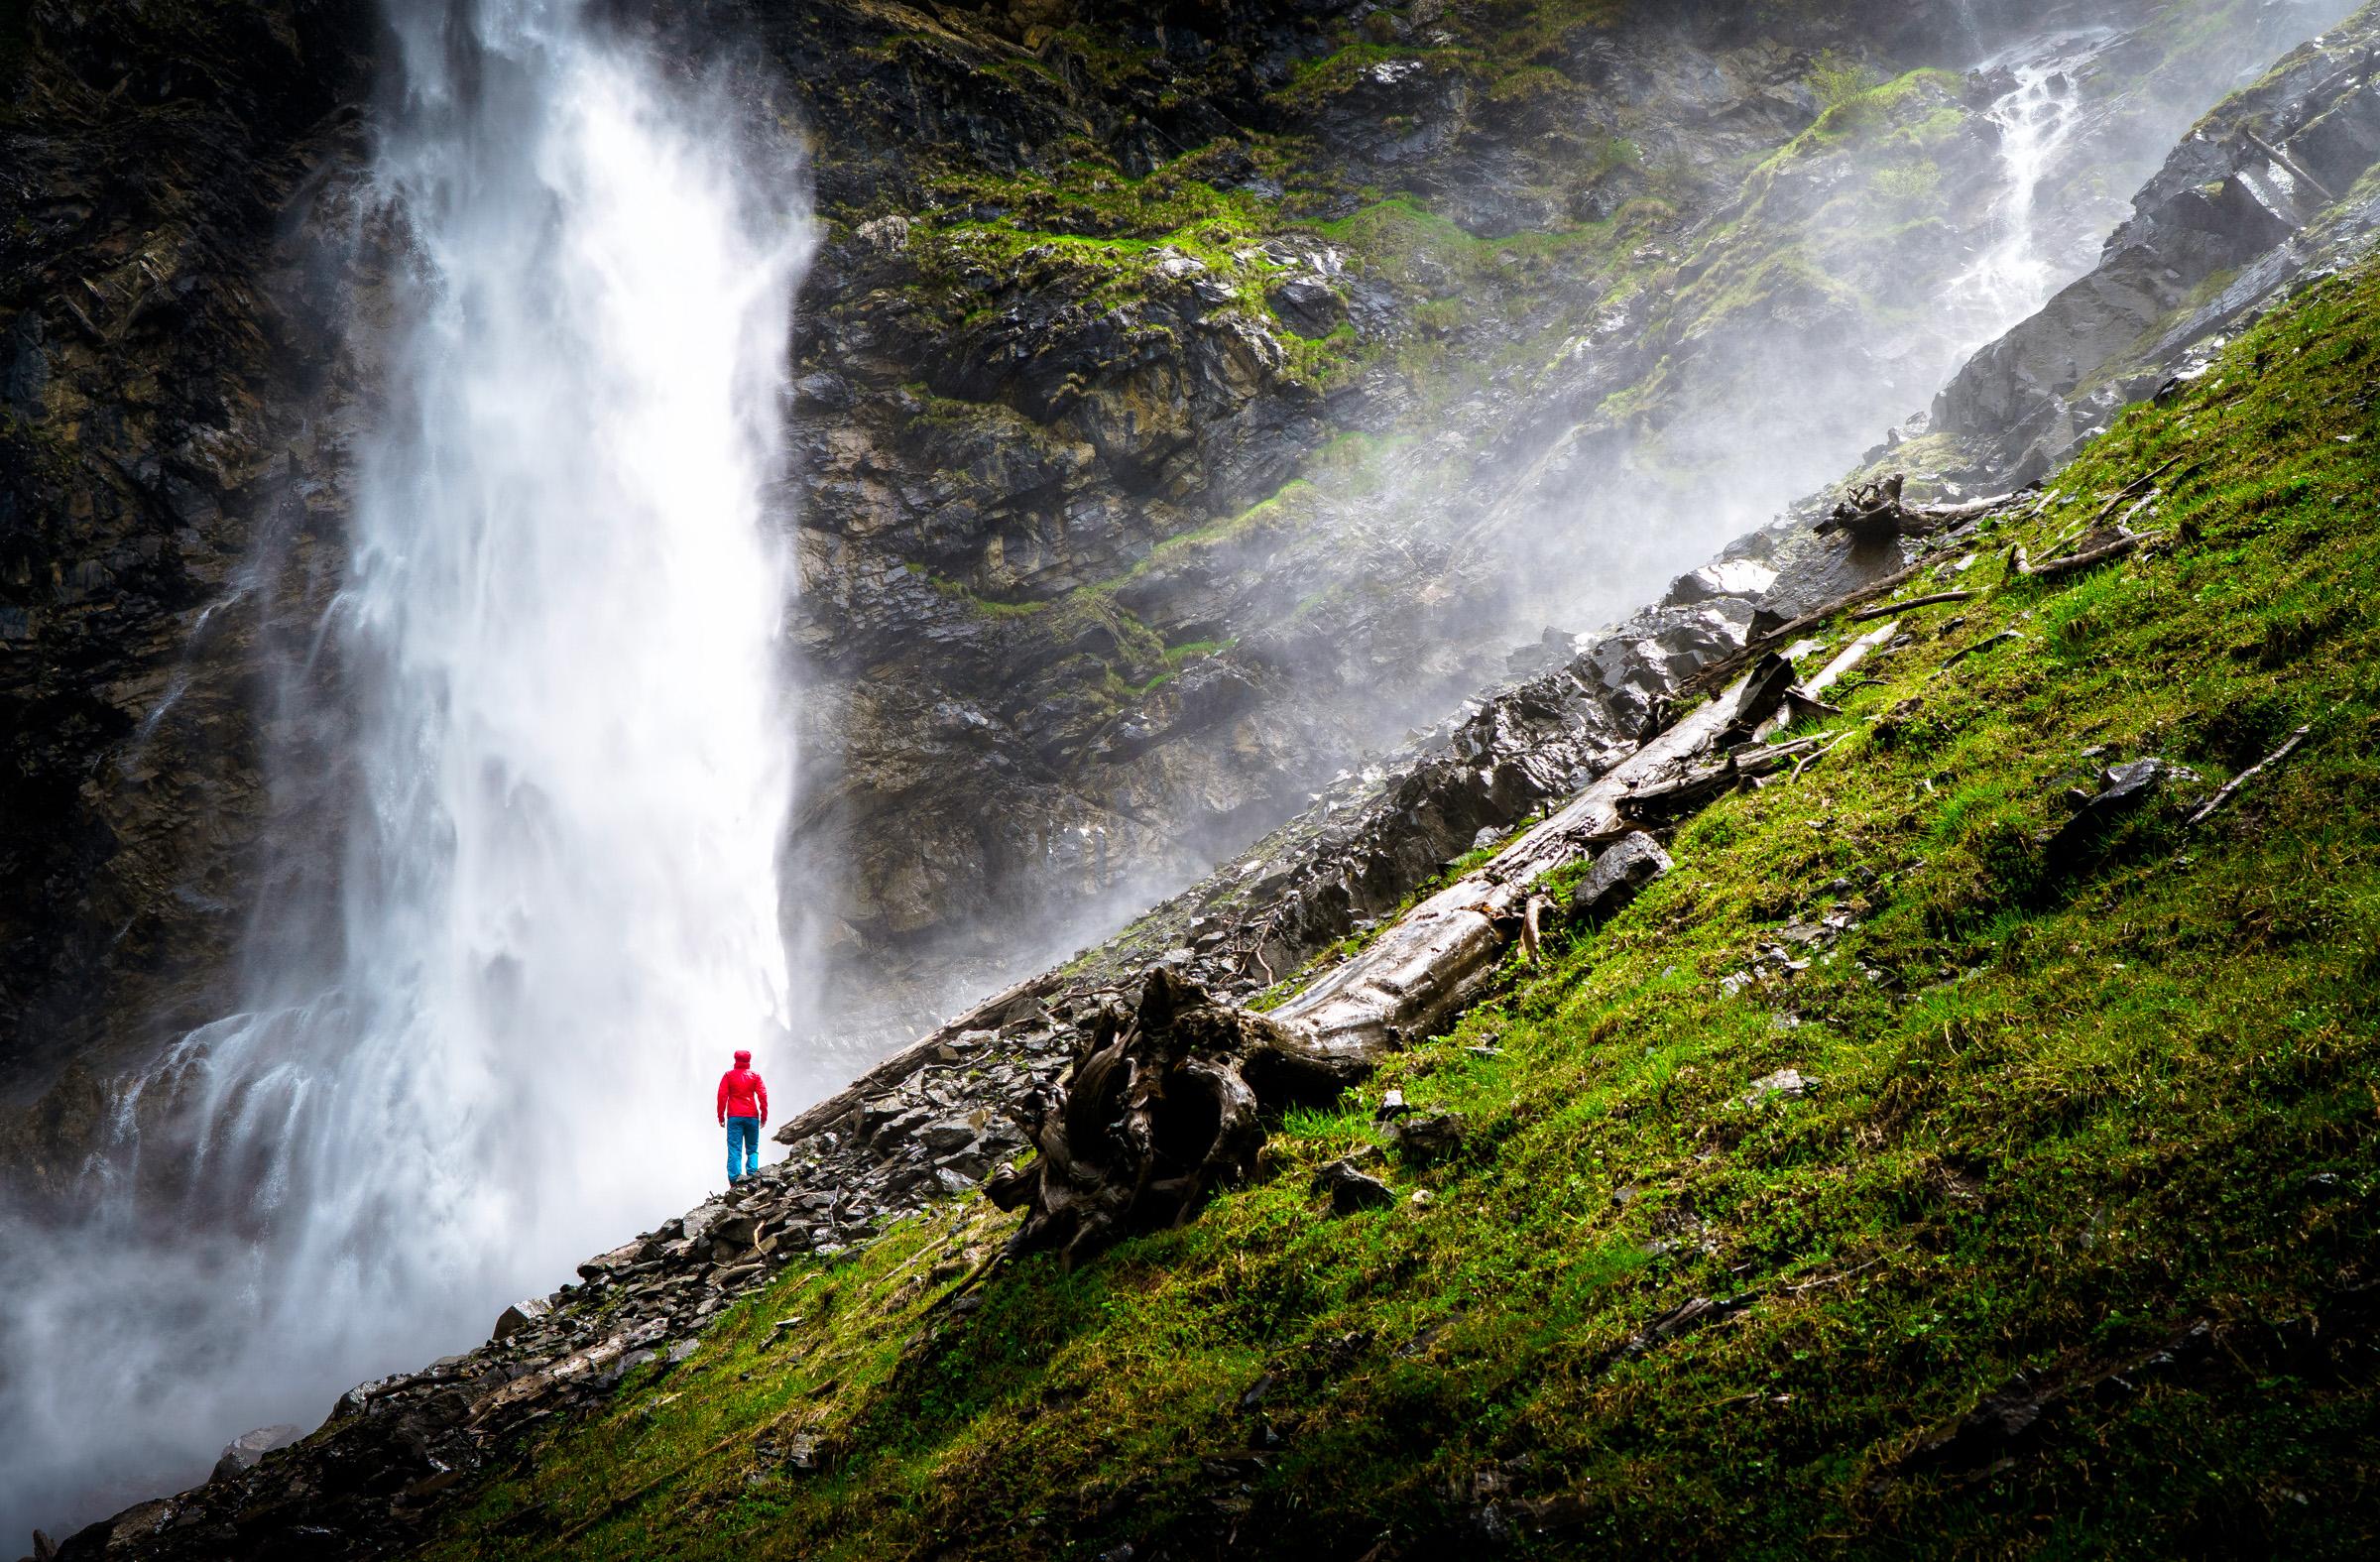 The WOW Waterfall